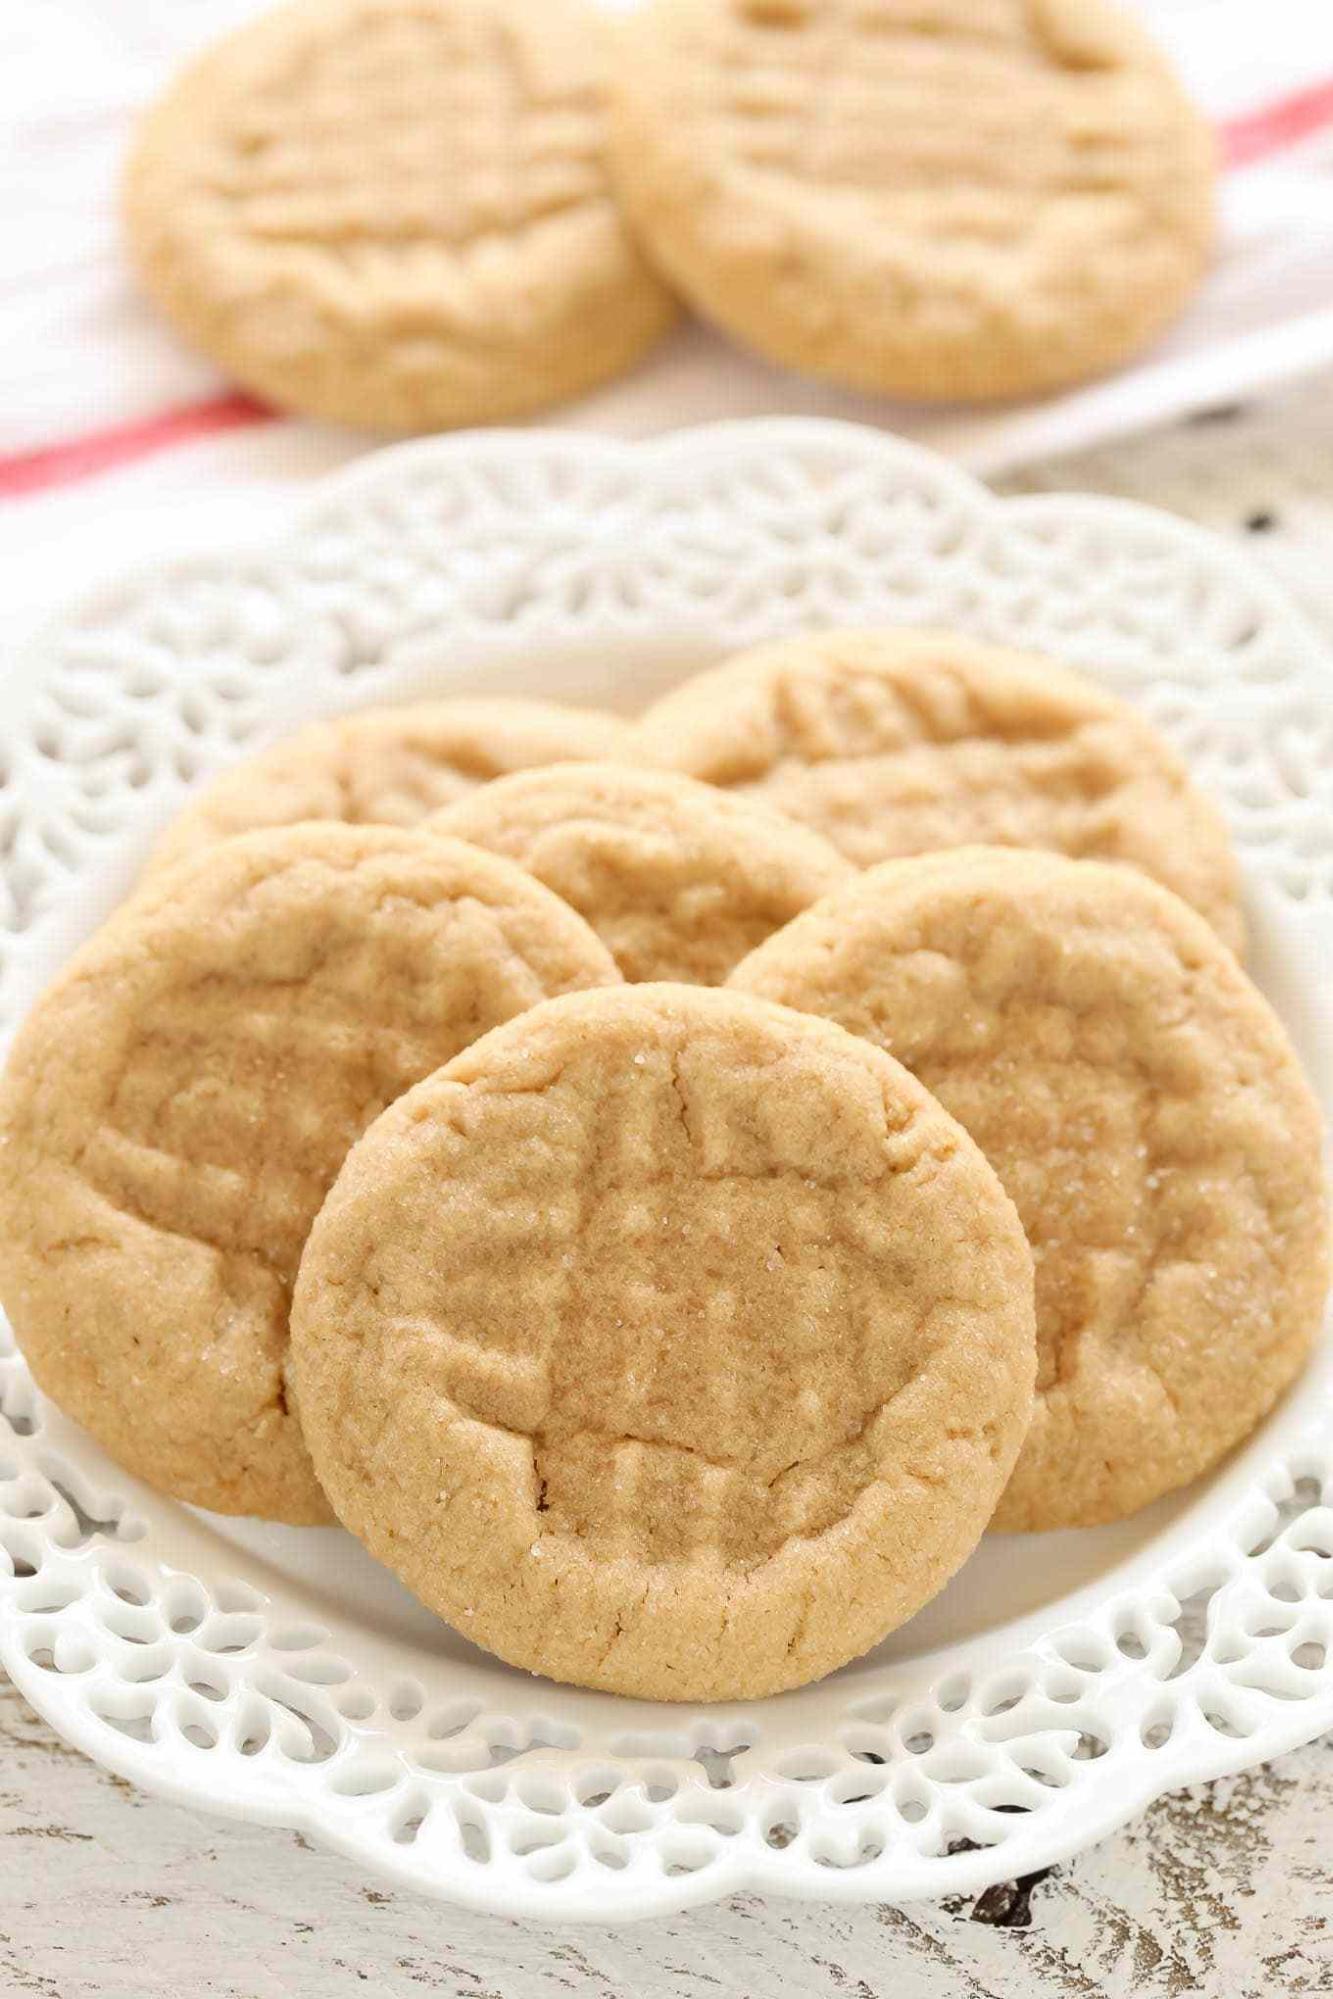 Red Branch Quarantine Cookbook peanut butter cookies